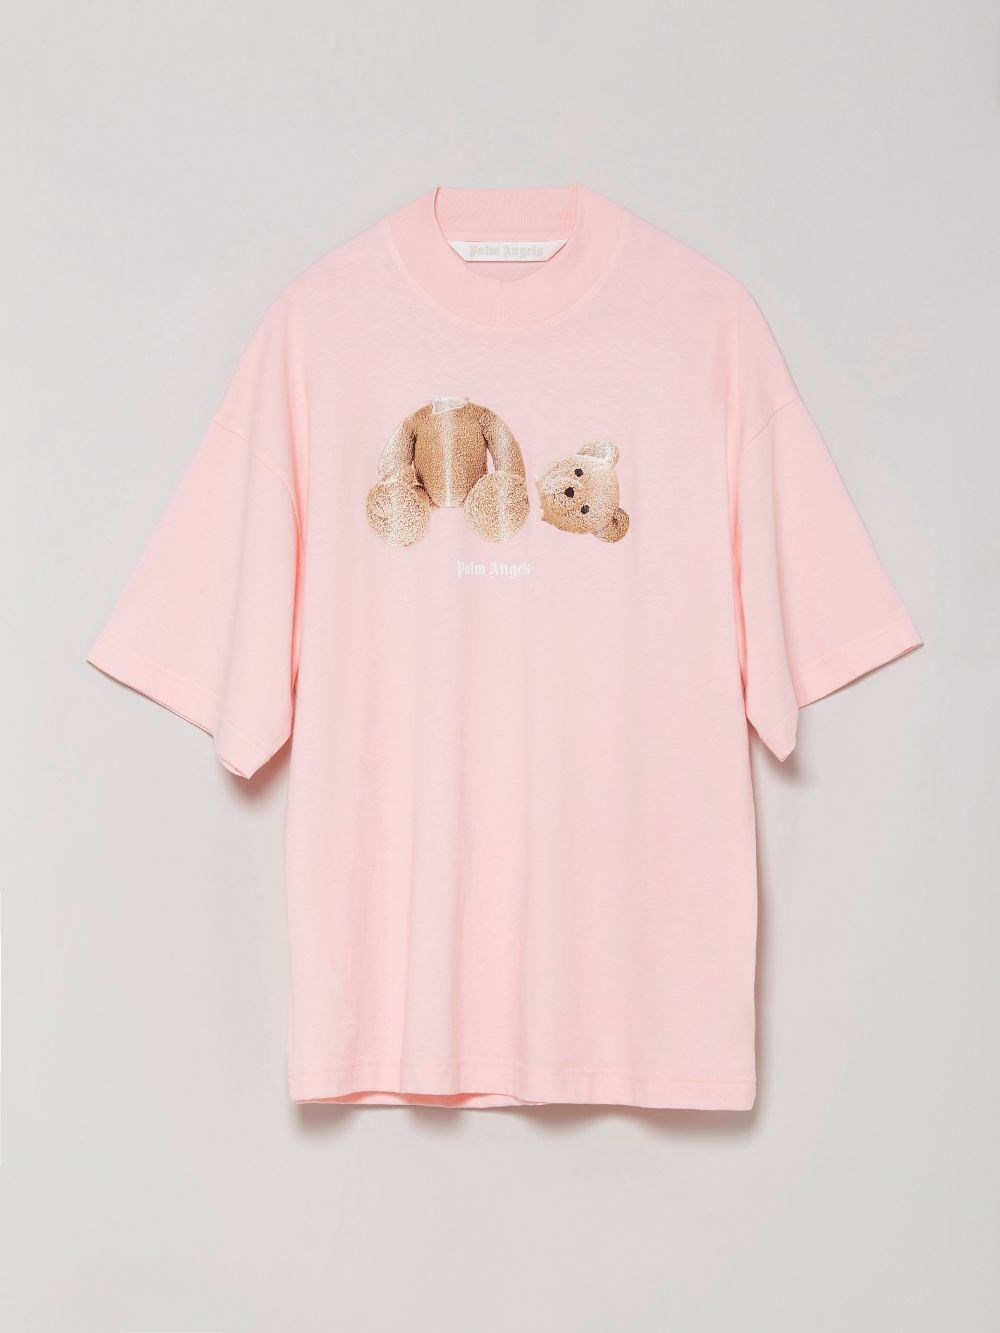 Palm Angels Cottons T-SHIRT TEDDY BEAR